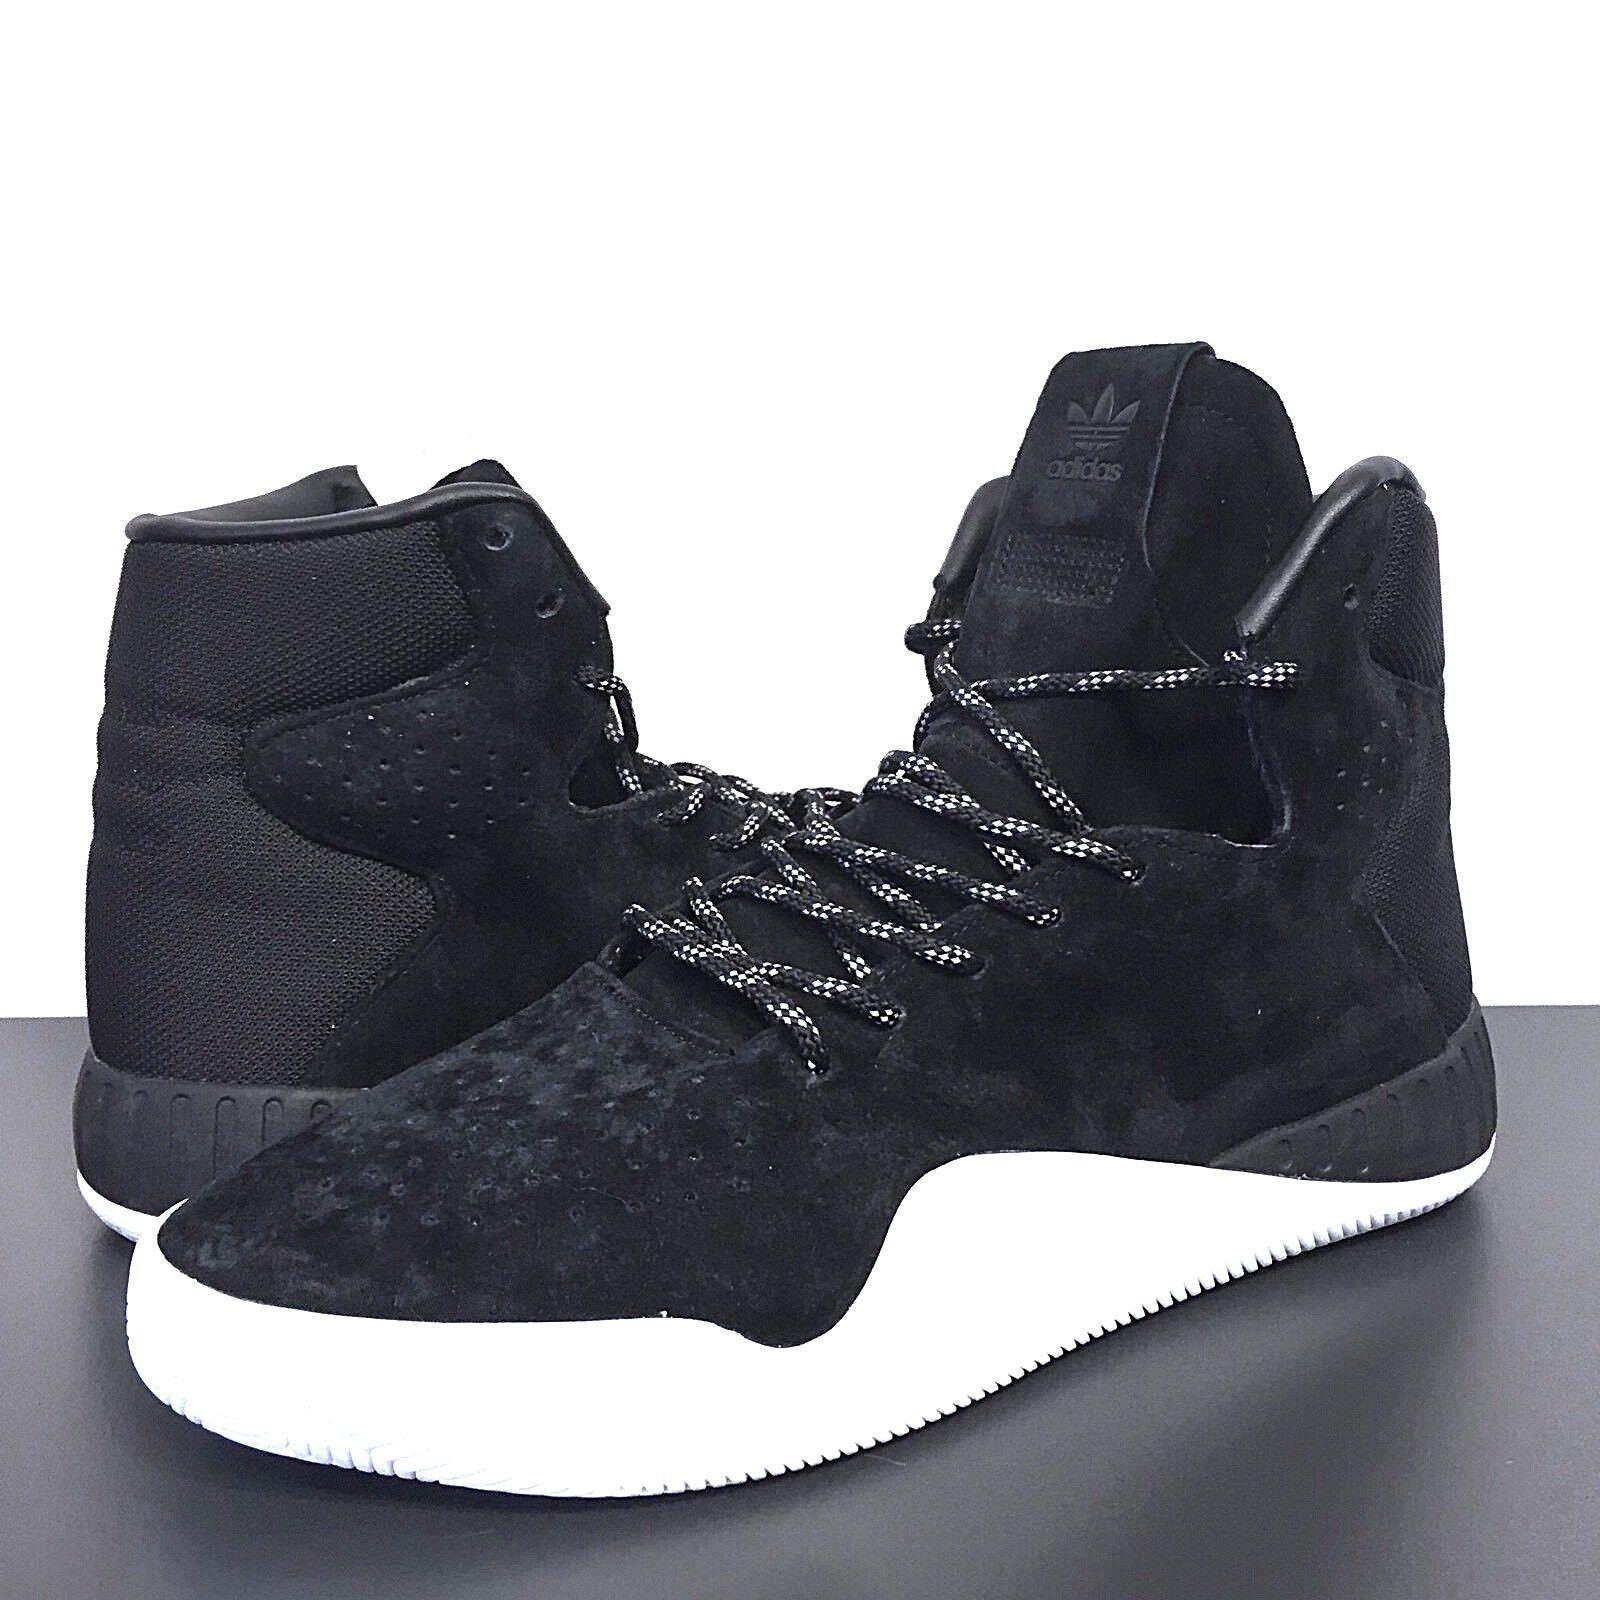 ADIDAS Mens Originals Tubular (MSRP Instinct S80085 Black Hightop Sneakers (MSRP Tubular $120) f4792e